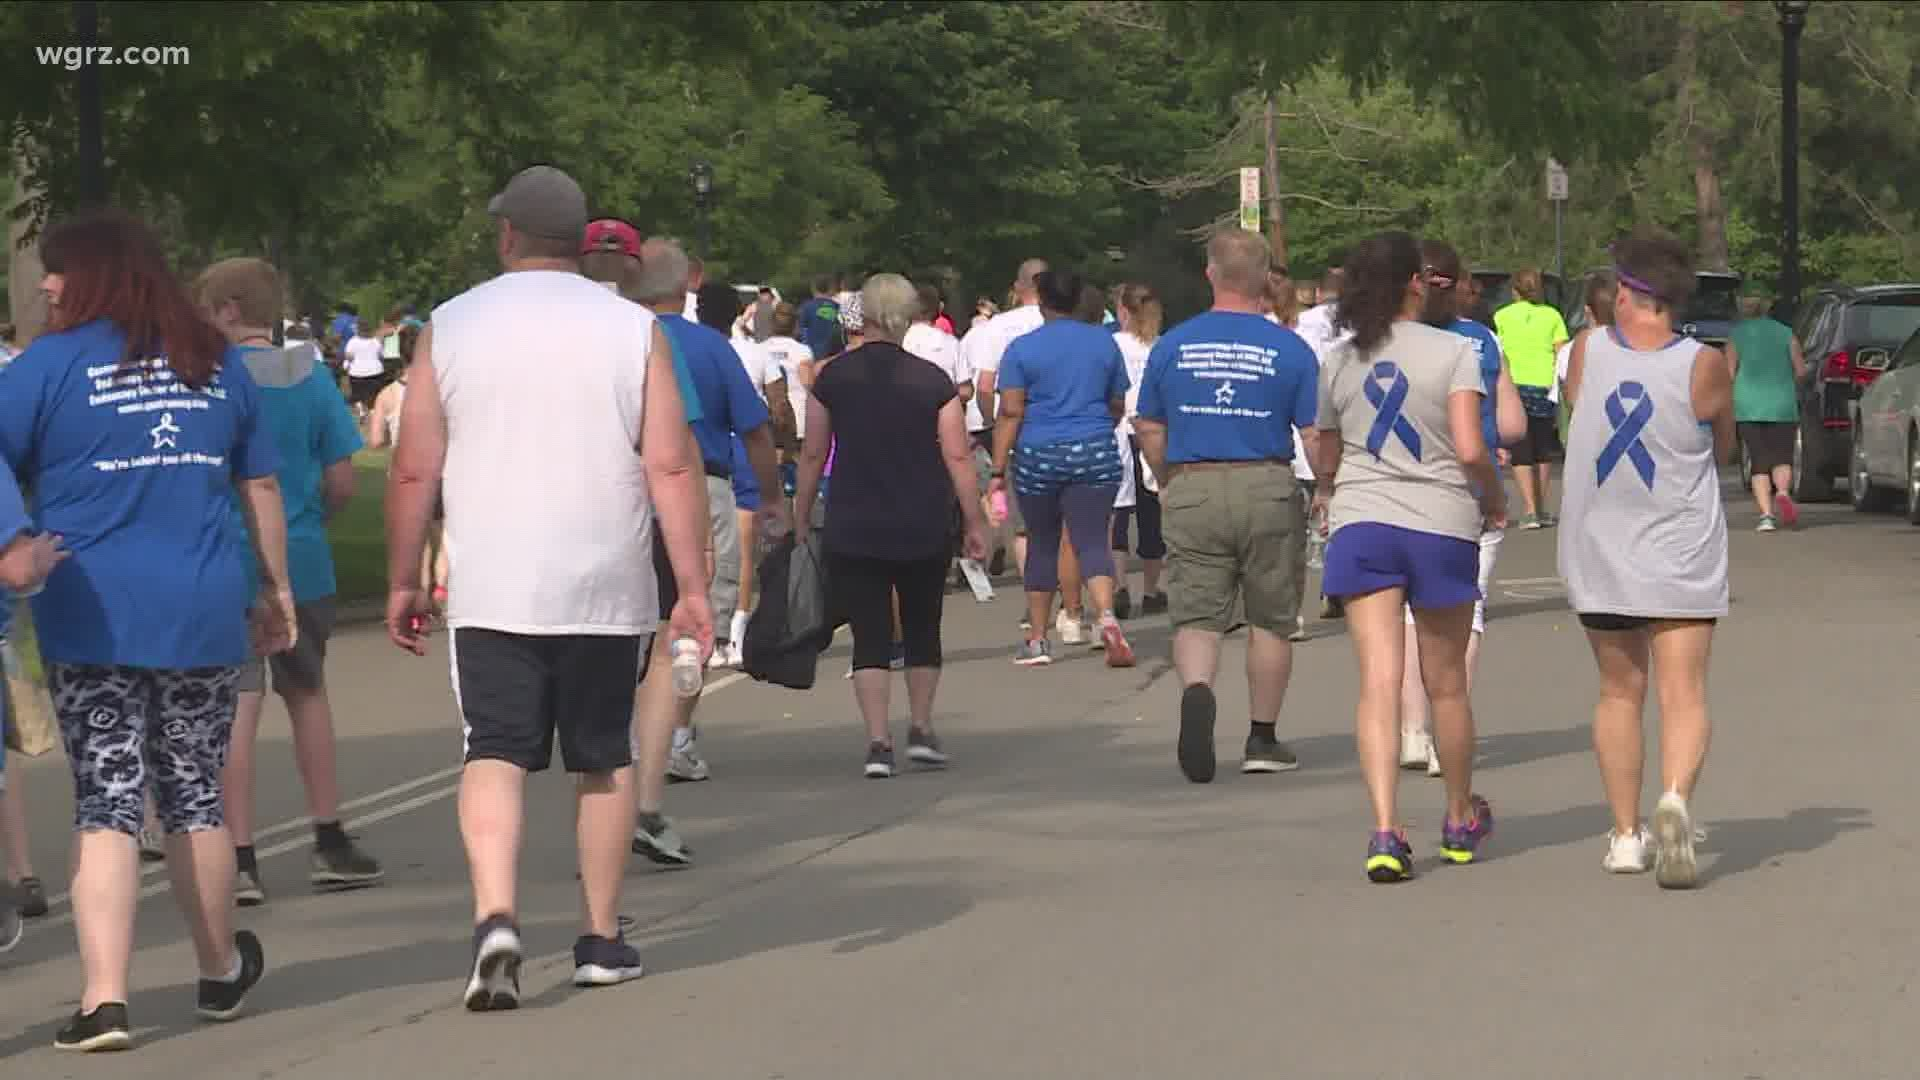 Buffalo S Walk To End Colon Cancer Goes Virtual Amid Covid 19 Pandemic Wgrz Com